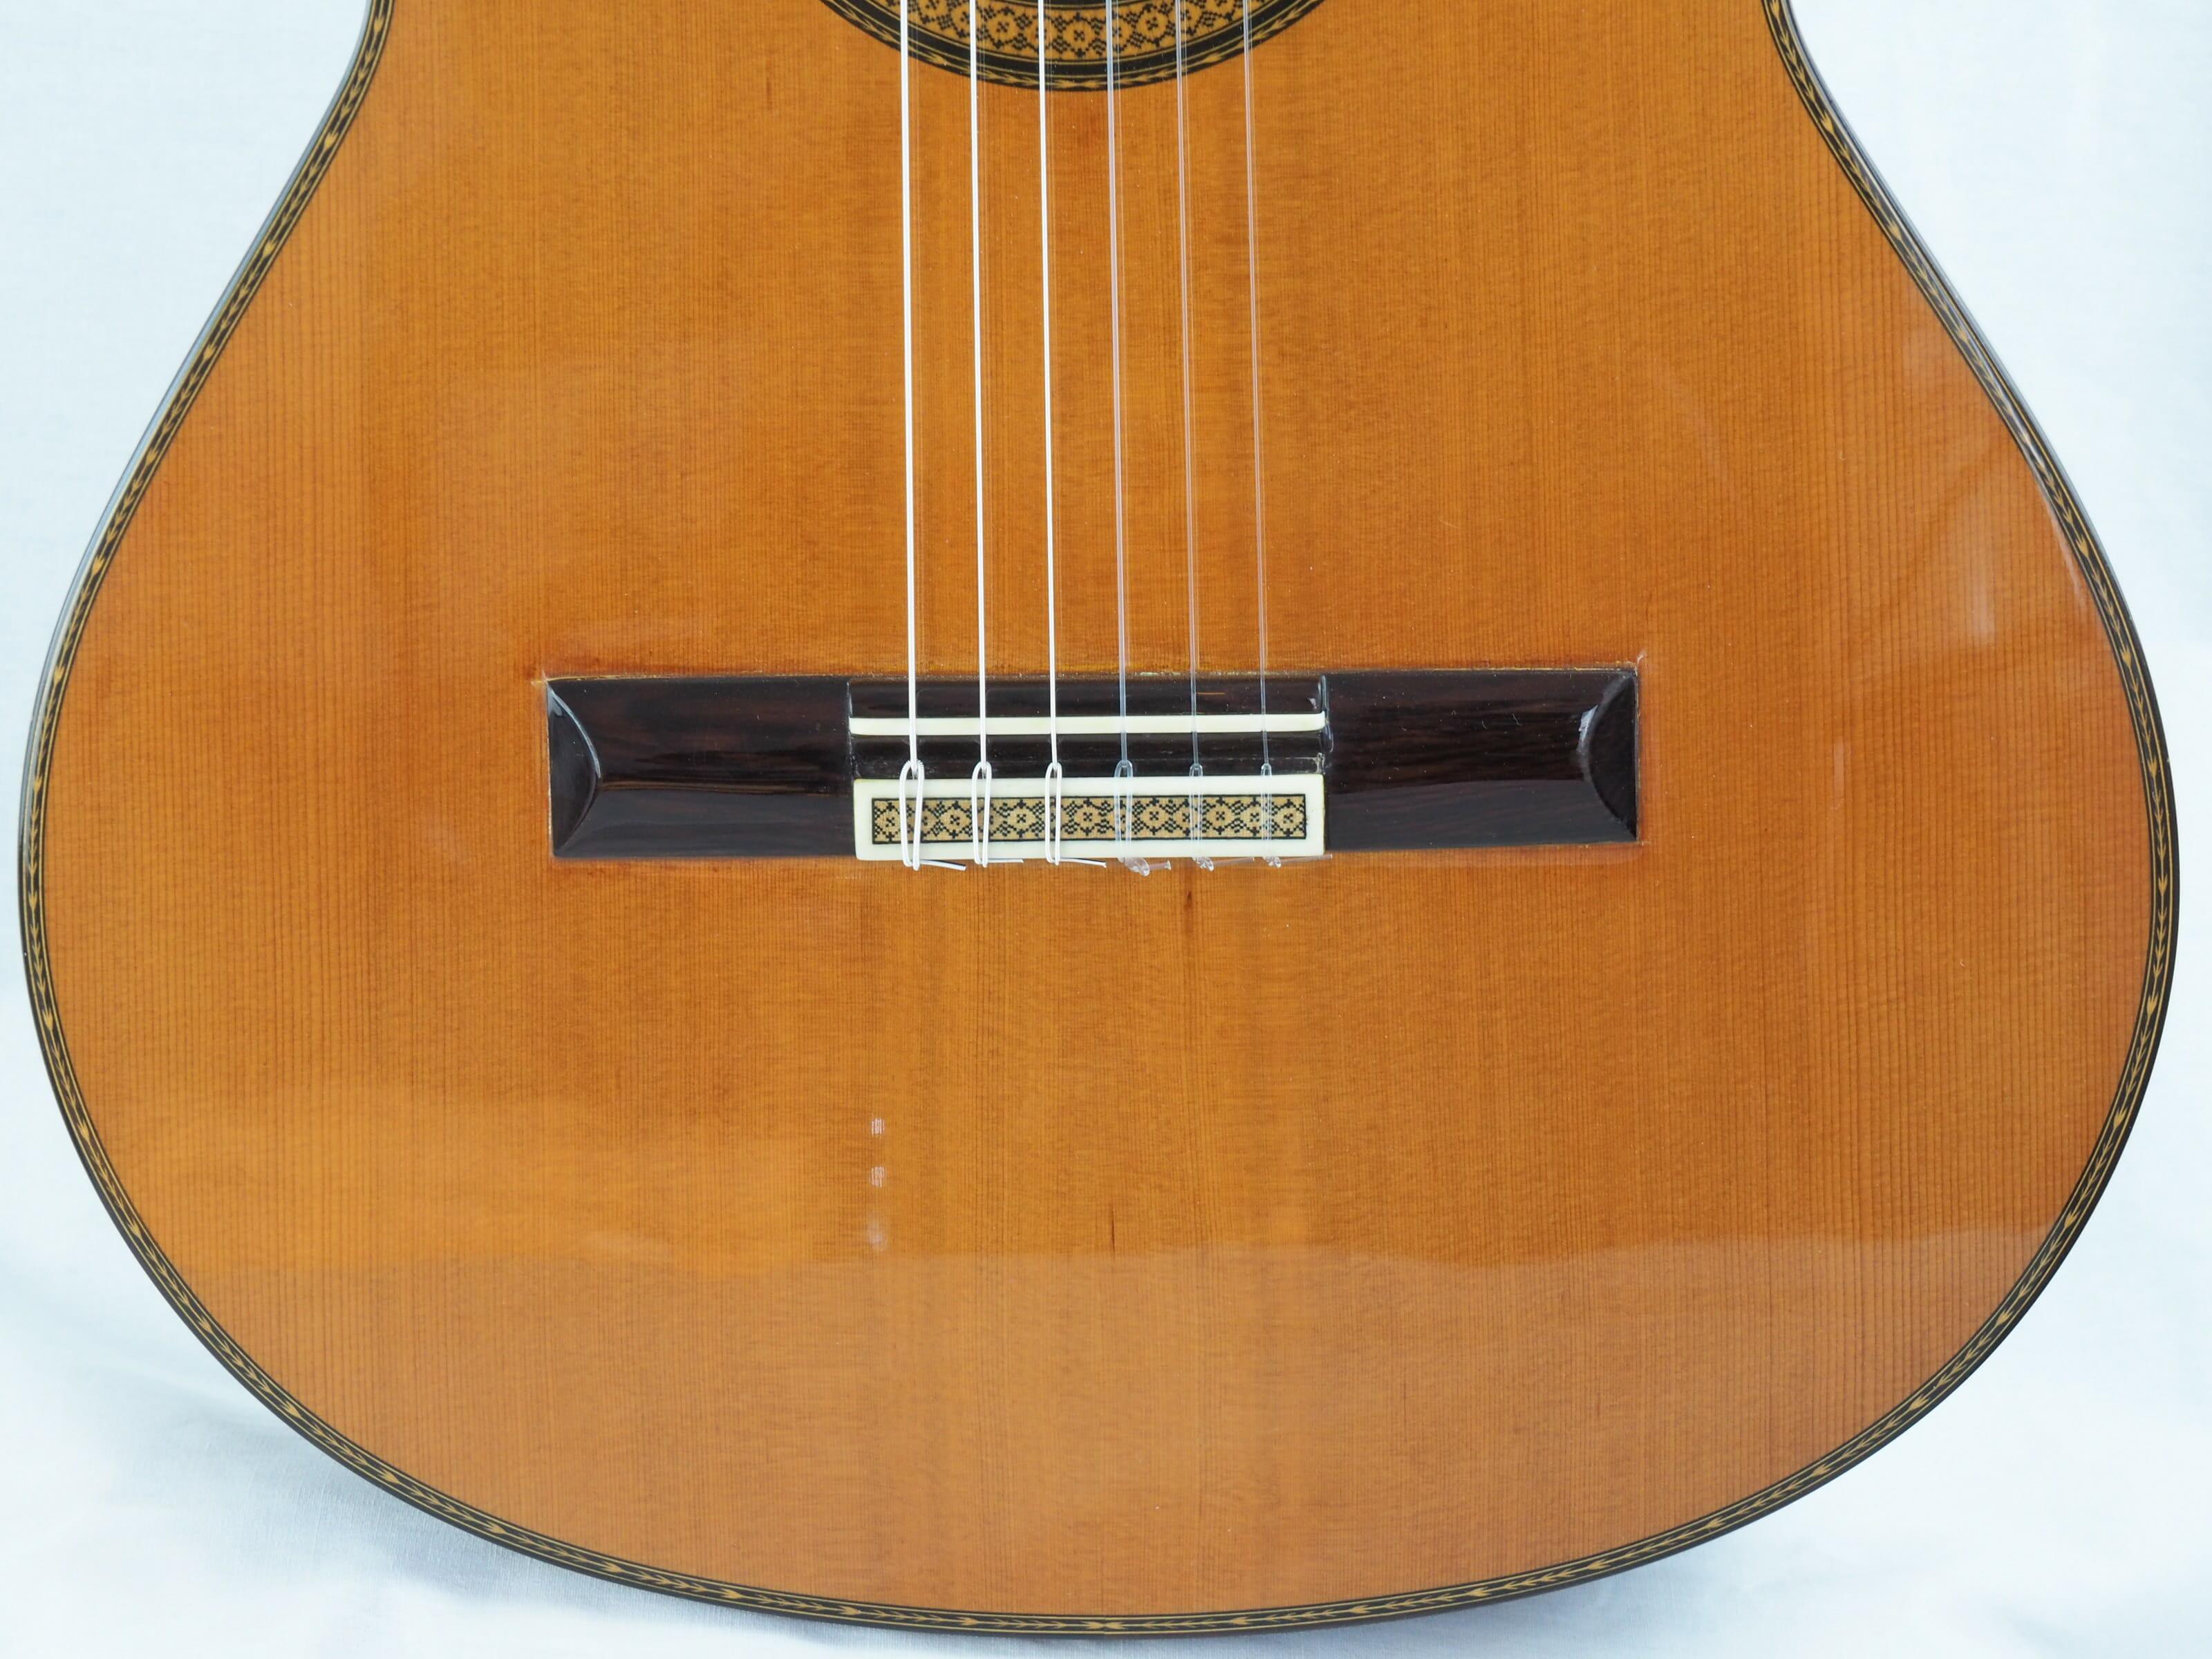 Manuel Contreras guitare classique luthier doble tap 1987 19CON087-06